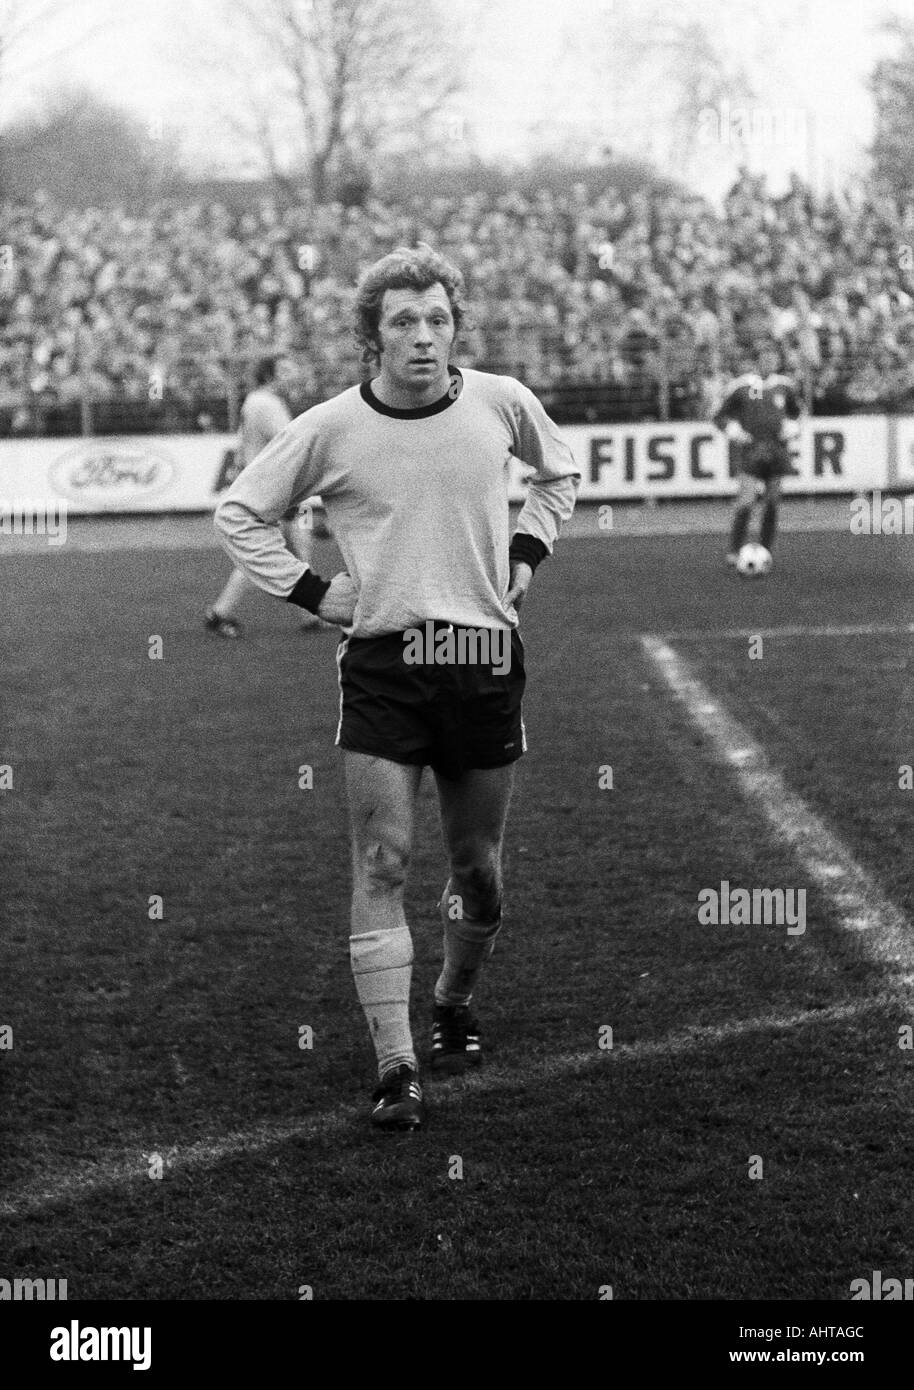 football, Bundesliga, 1971/1972, VfL Bochum versus Borussia Dortmund 4:2, Stadium at the Castroper Strasse in Bochum, football player was sent off, sending-off to Siegfried Koestler (BVB) - Stock Image